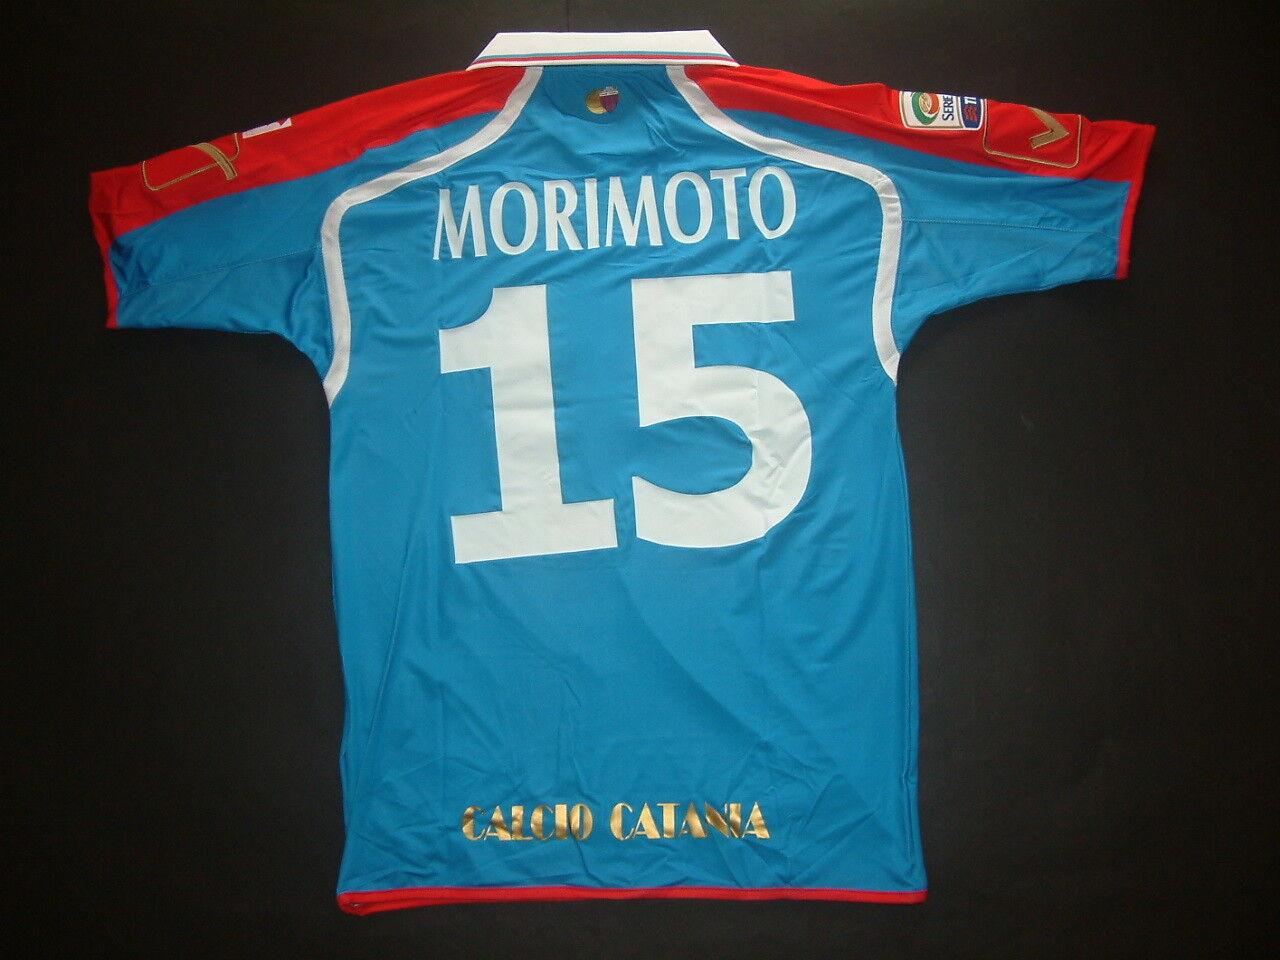 MORIMOTO CATANIA HOME match issued MC-SS 2010-2011 TIM CUP